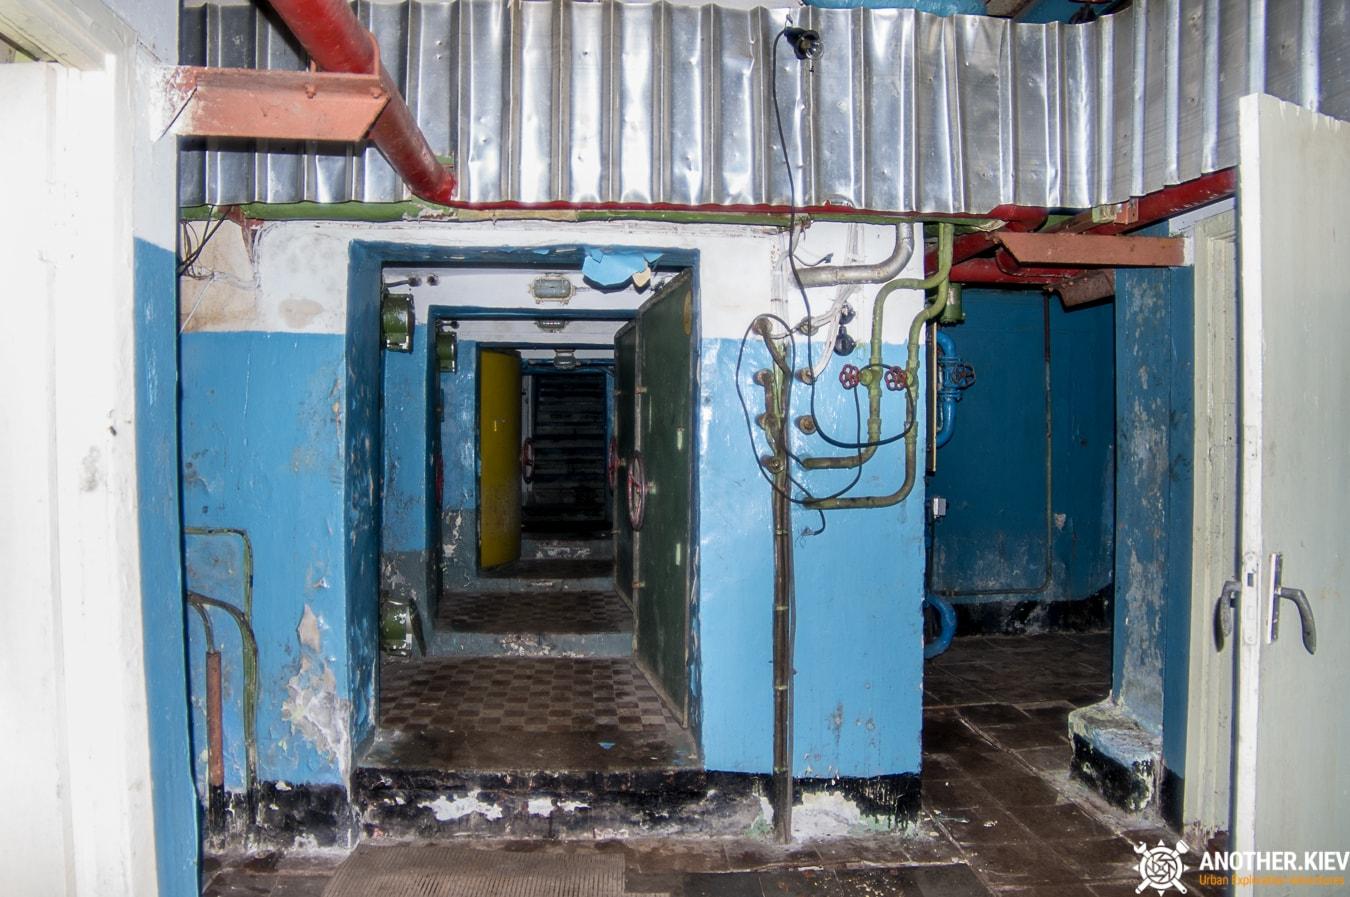 exploring-nuclear-bunker-duga-34 HIDDEN CHERNOBYL: EXPLORING NUCLEAR BUNKER  OF DUGA-3 RADAR STATION